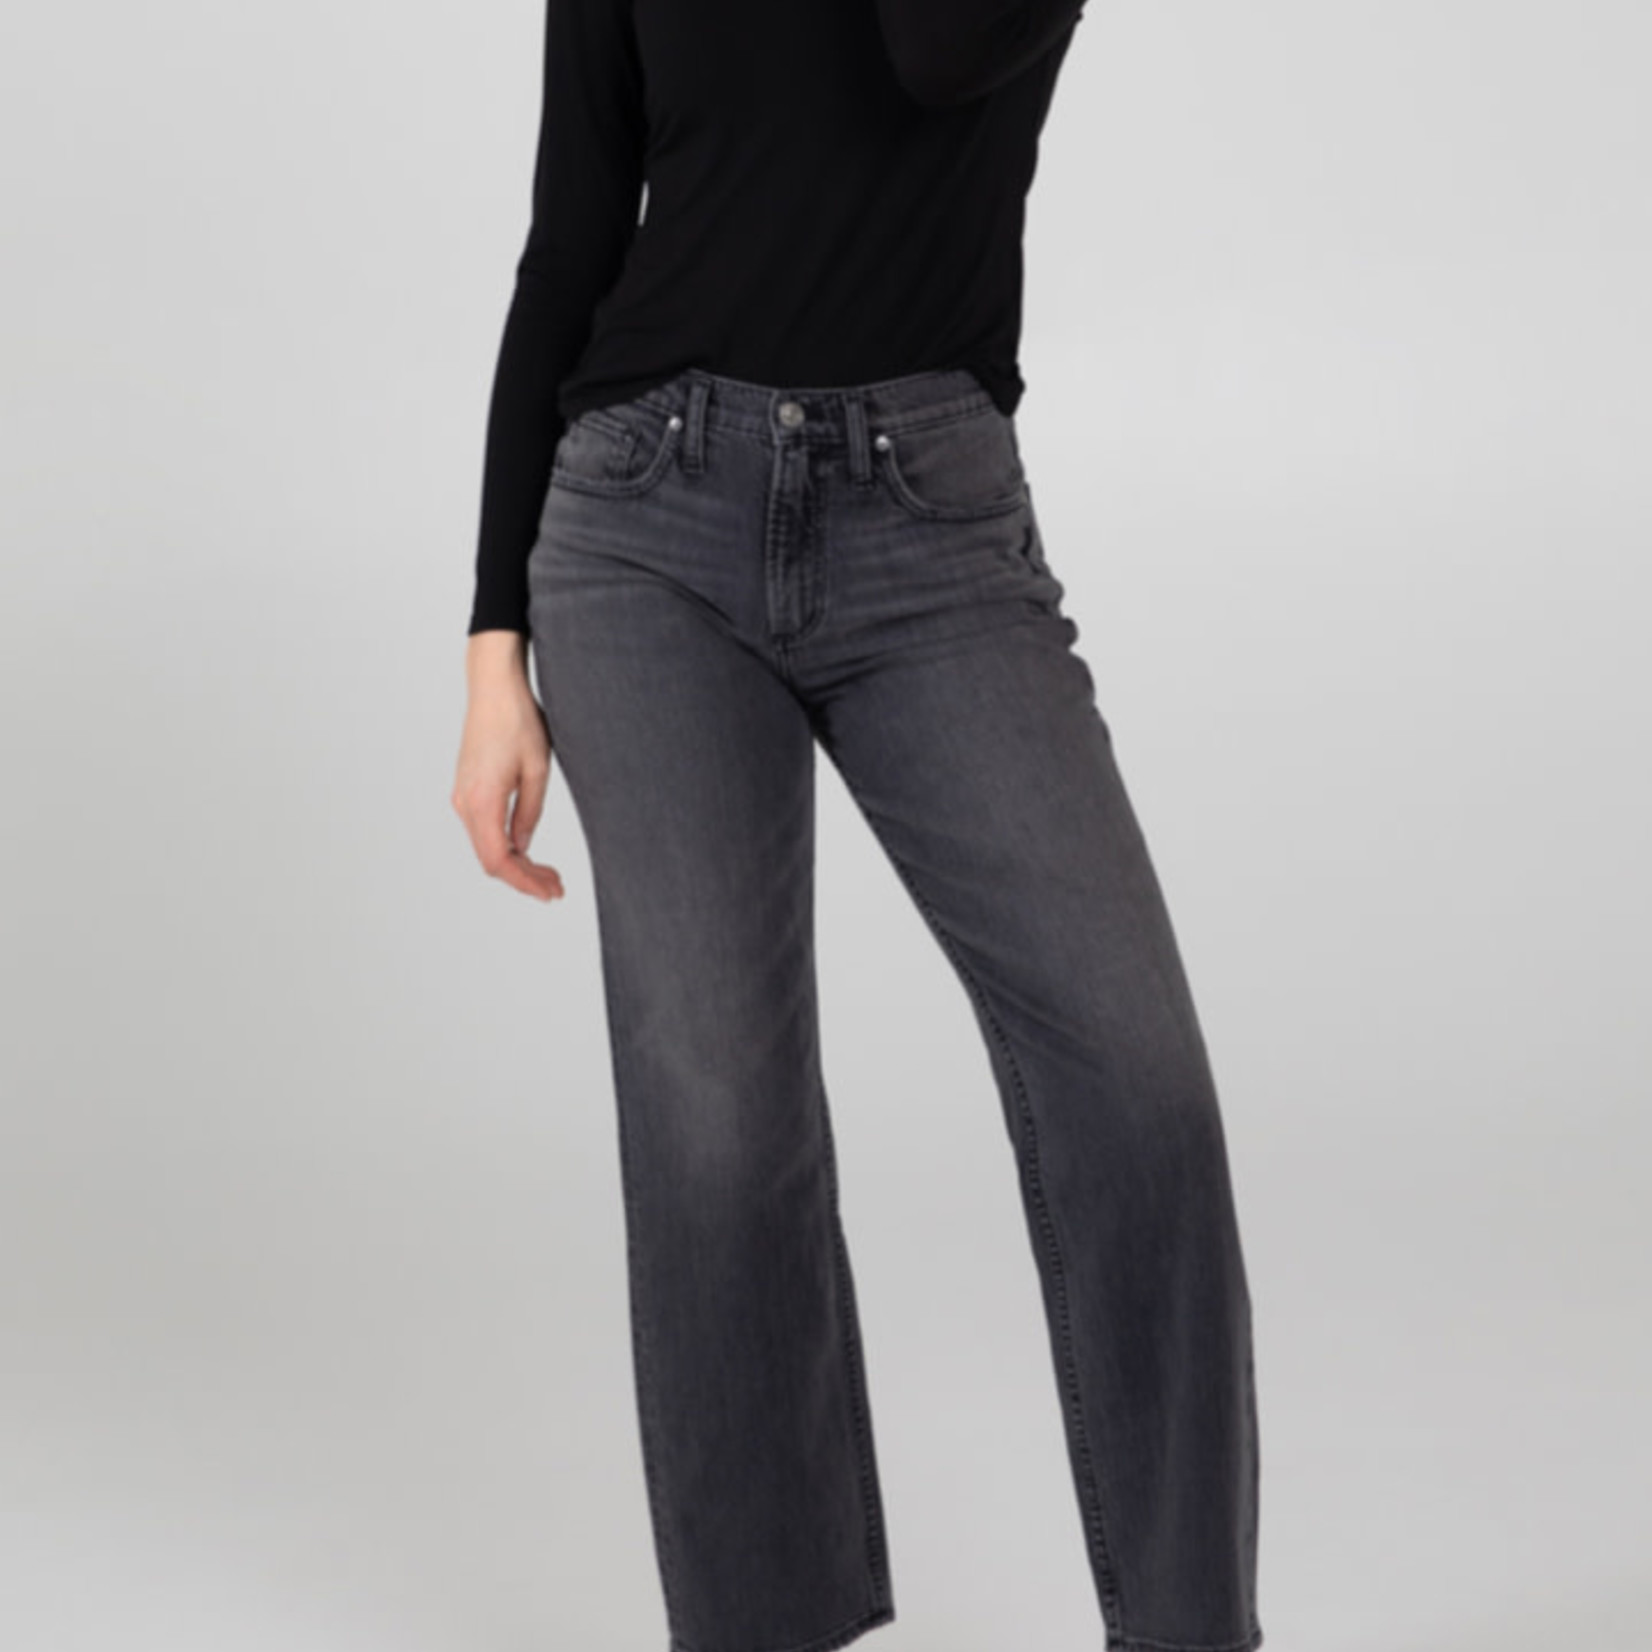 Silver Jeans Co. Frisco Straight Leg